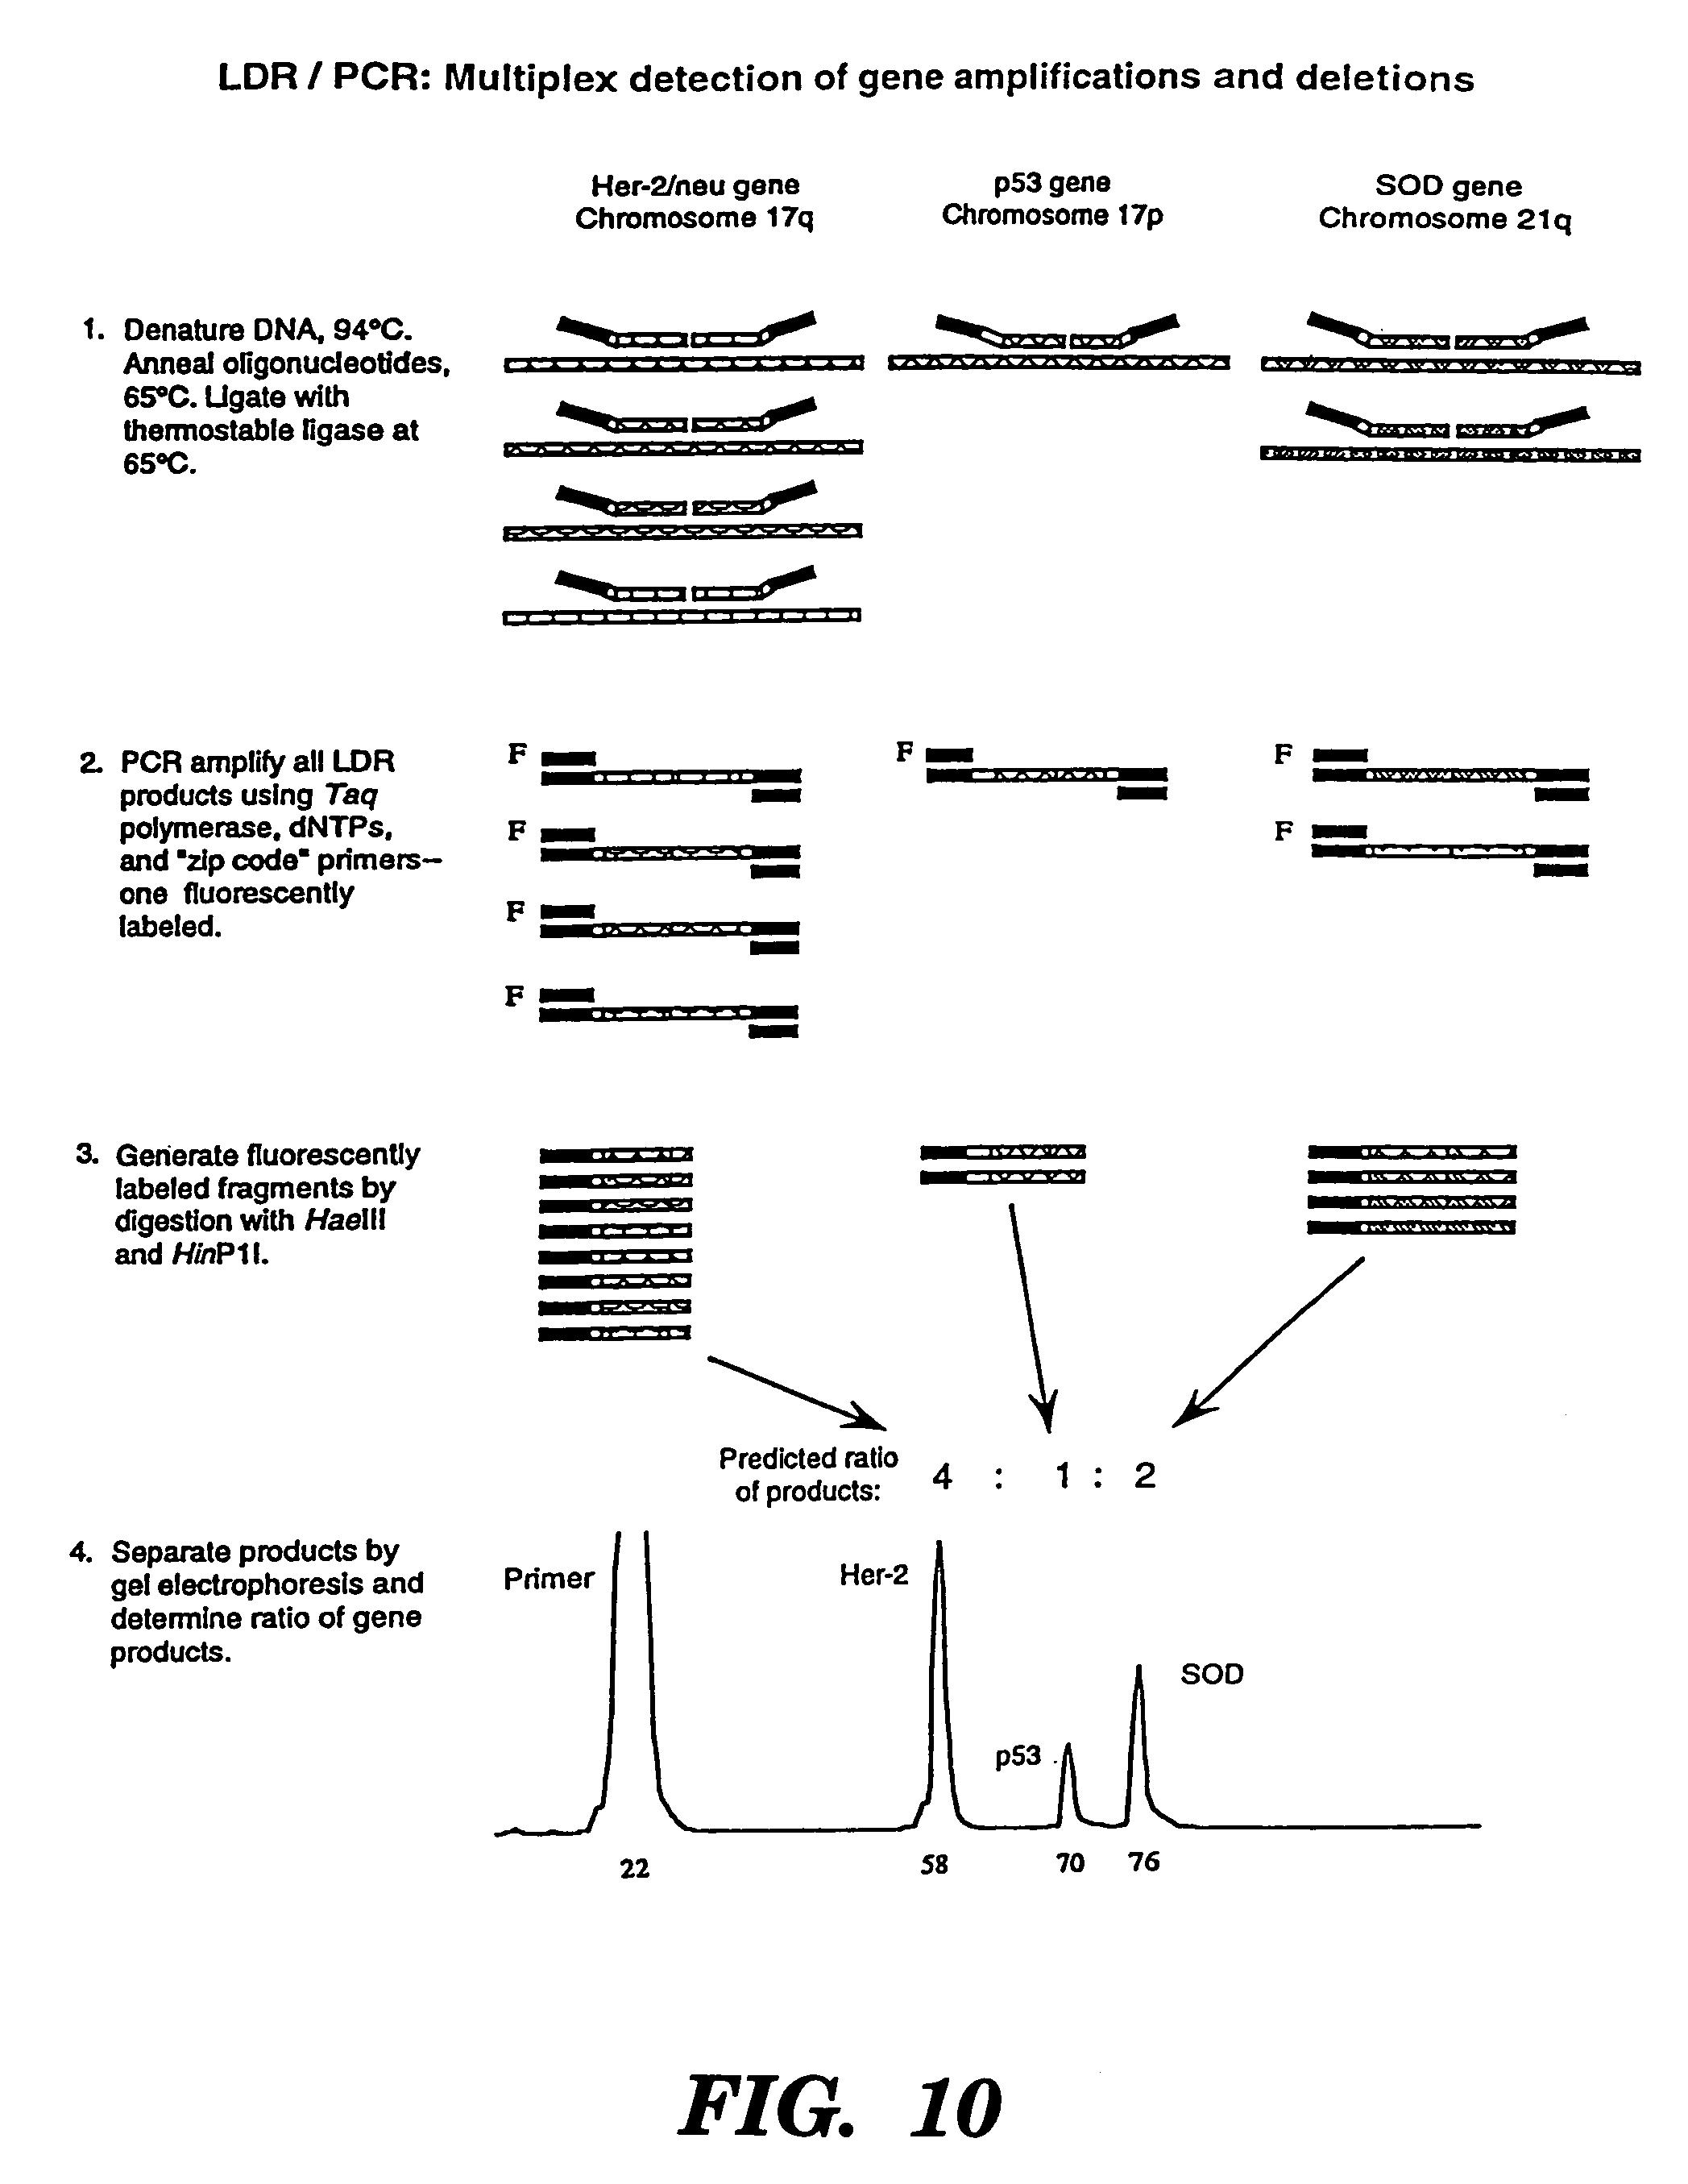 Patent US 7,320,865 B2